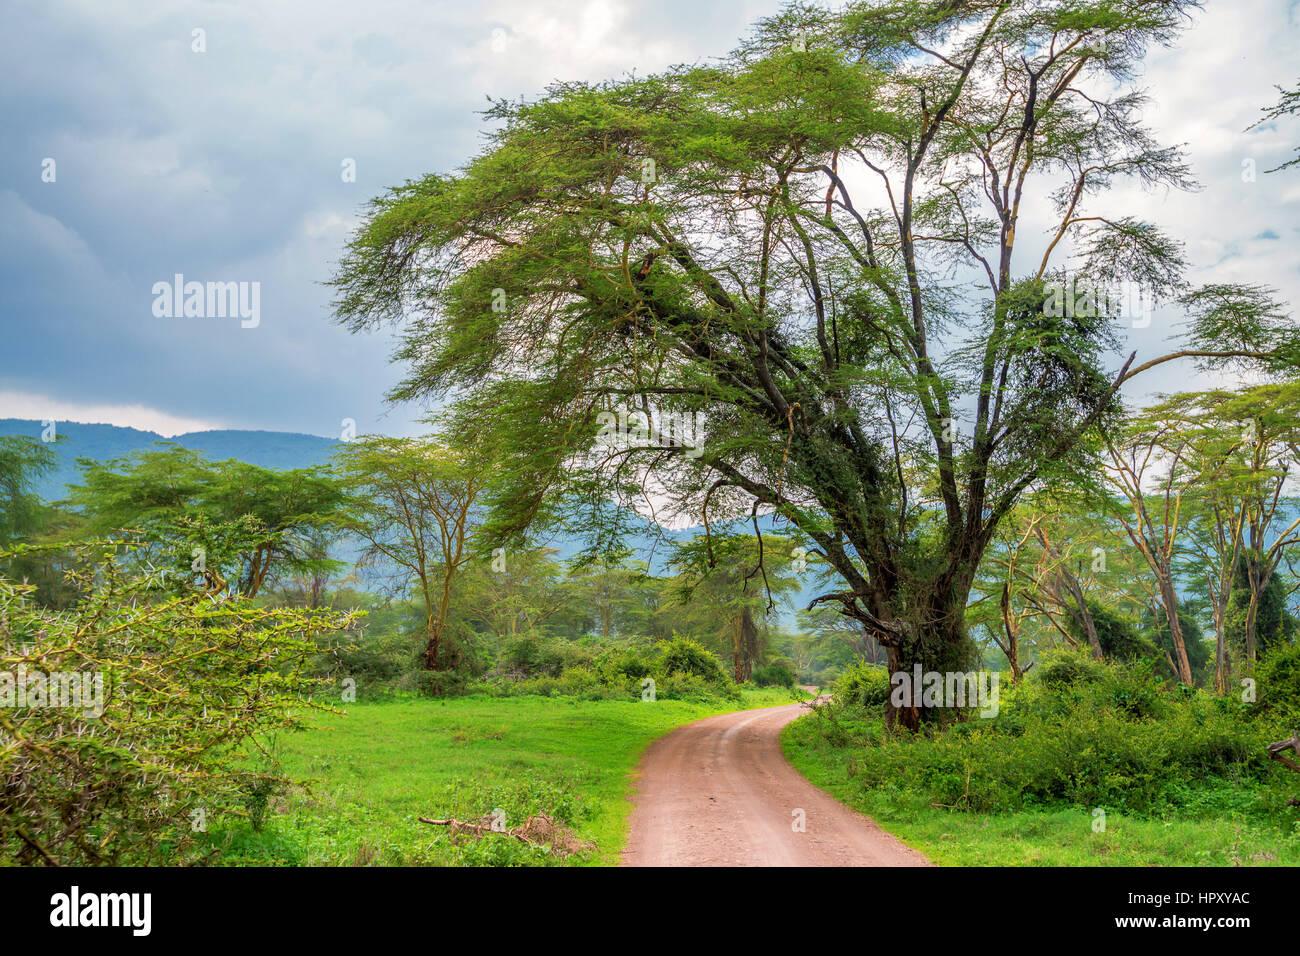 Montagna foresta africana con acacia e lussureggianti cespugli in Ngorongoro national park, Tanzania Immagini Stock